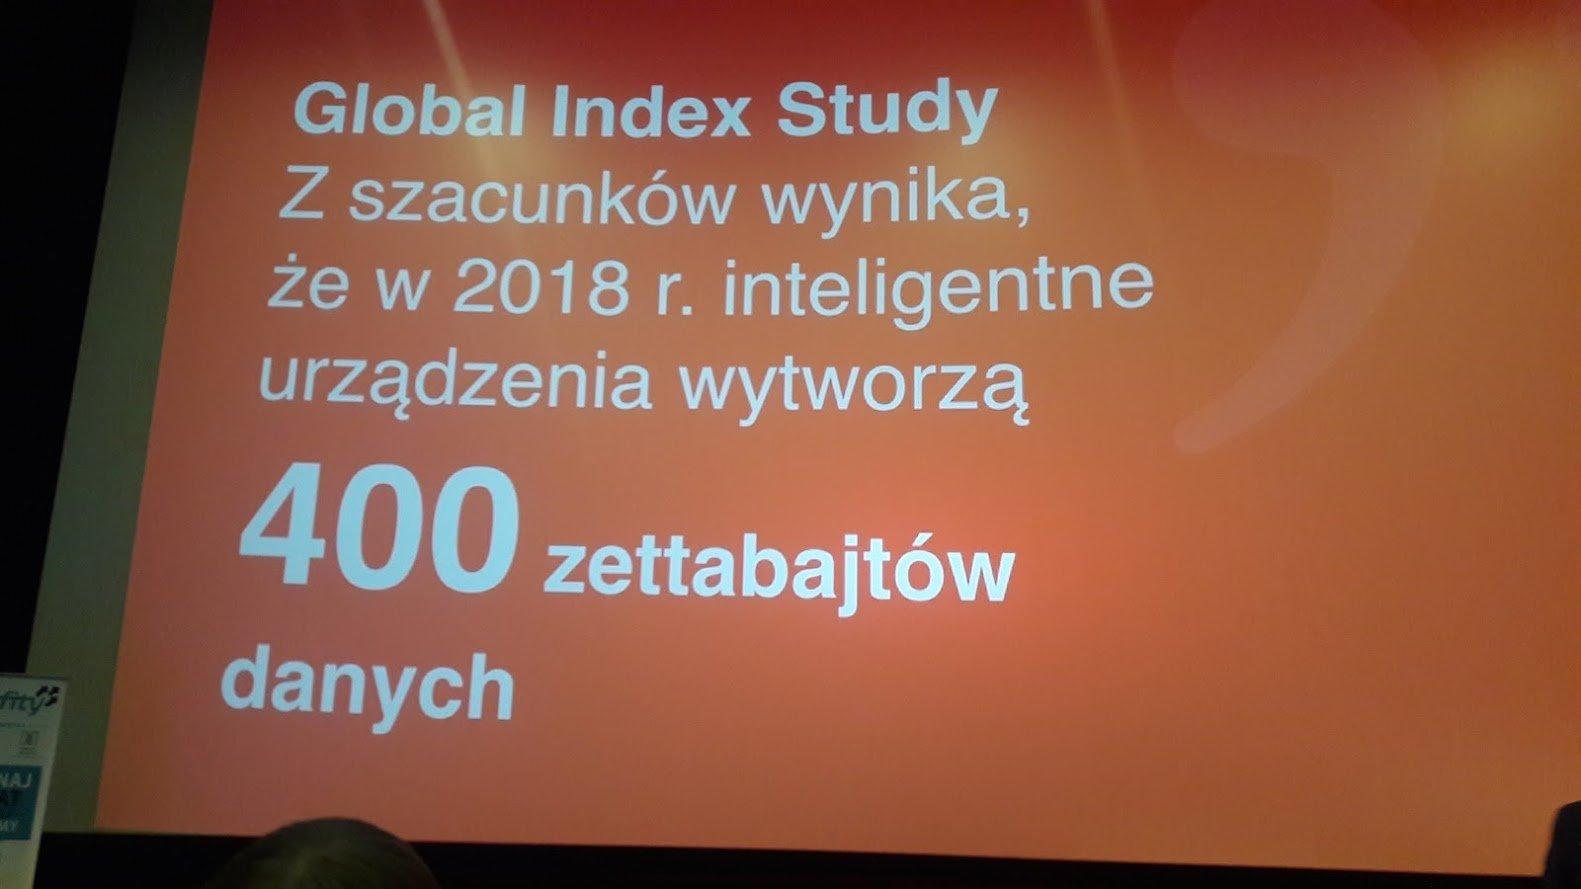 Global Index Study